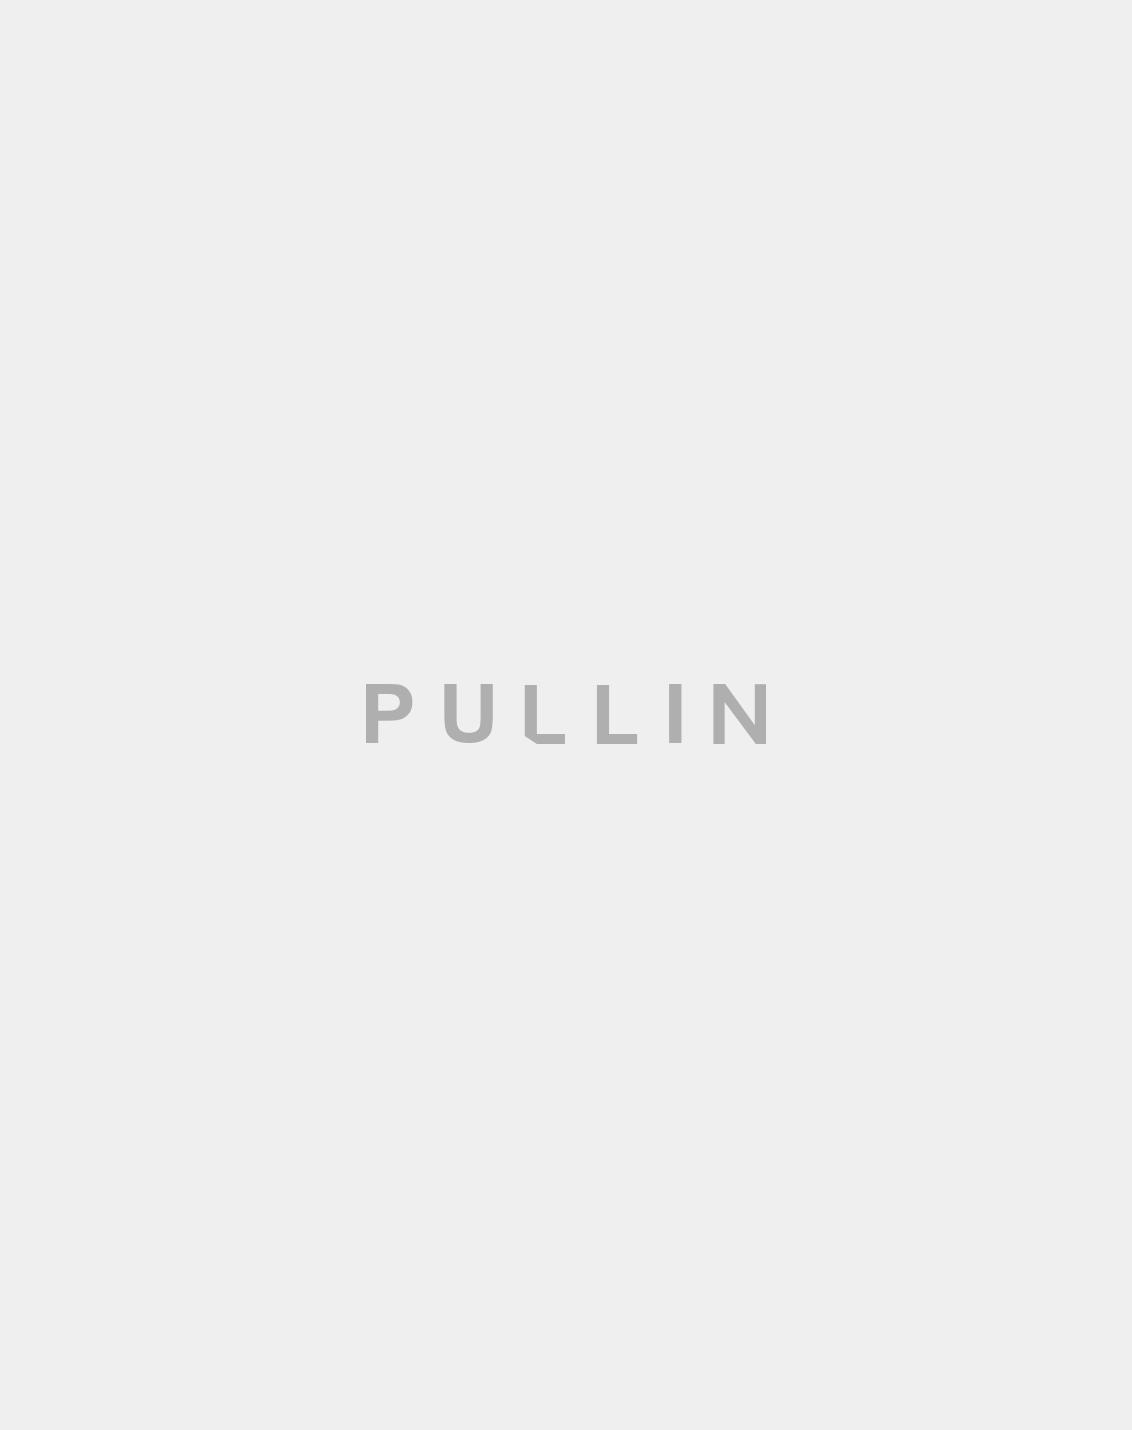 T-shirt cornelius homme - pull in 4